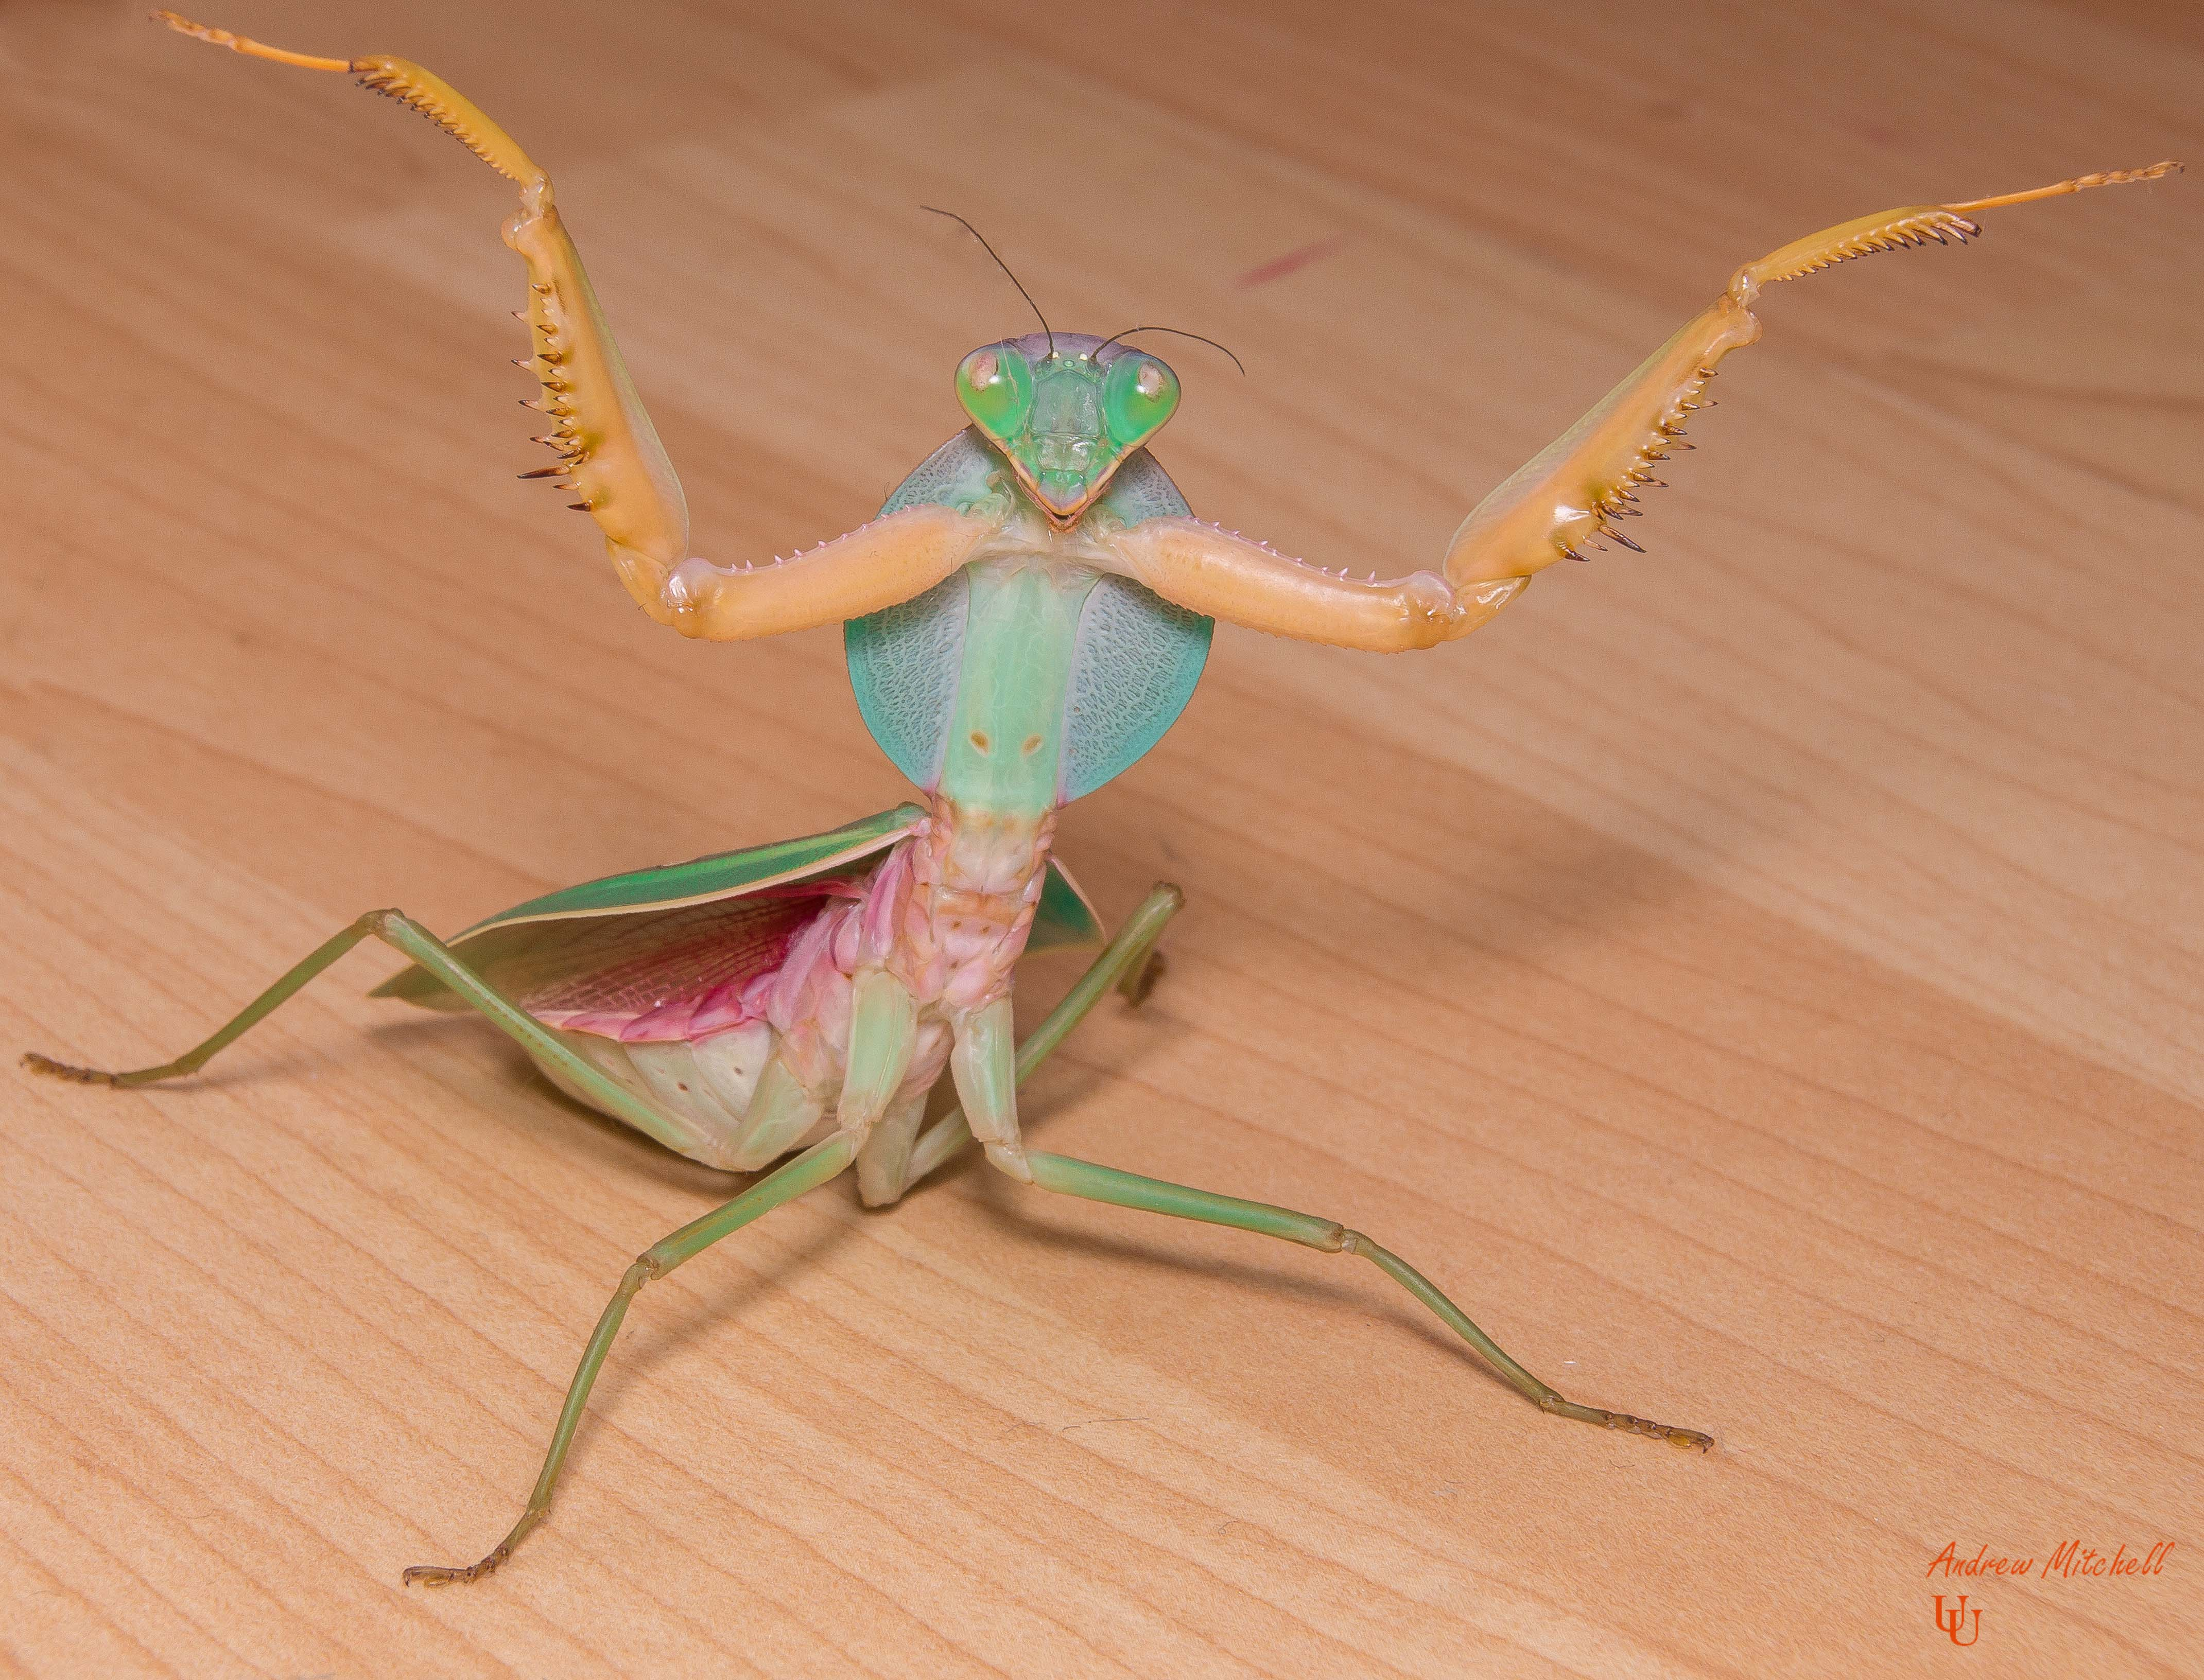 Rhombodera Valida Giant Malaysian Shield Mantis The